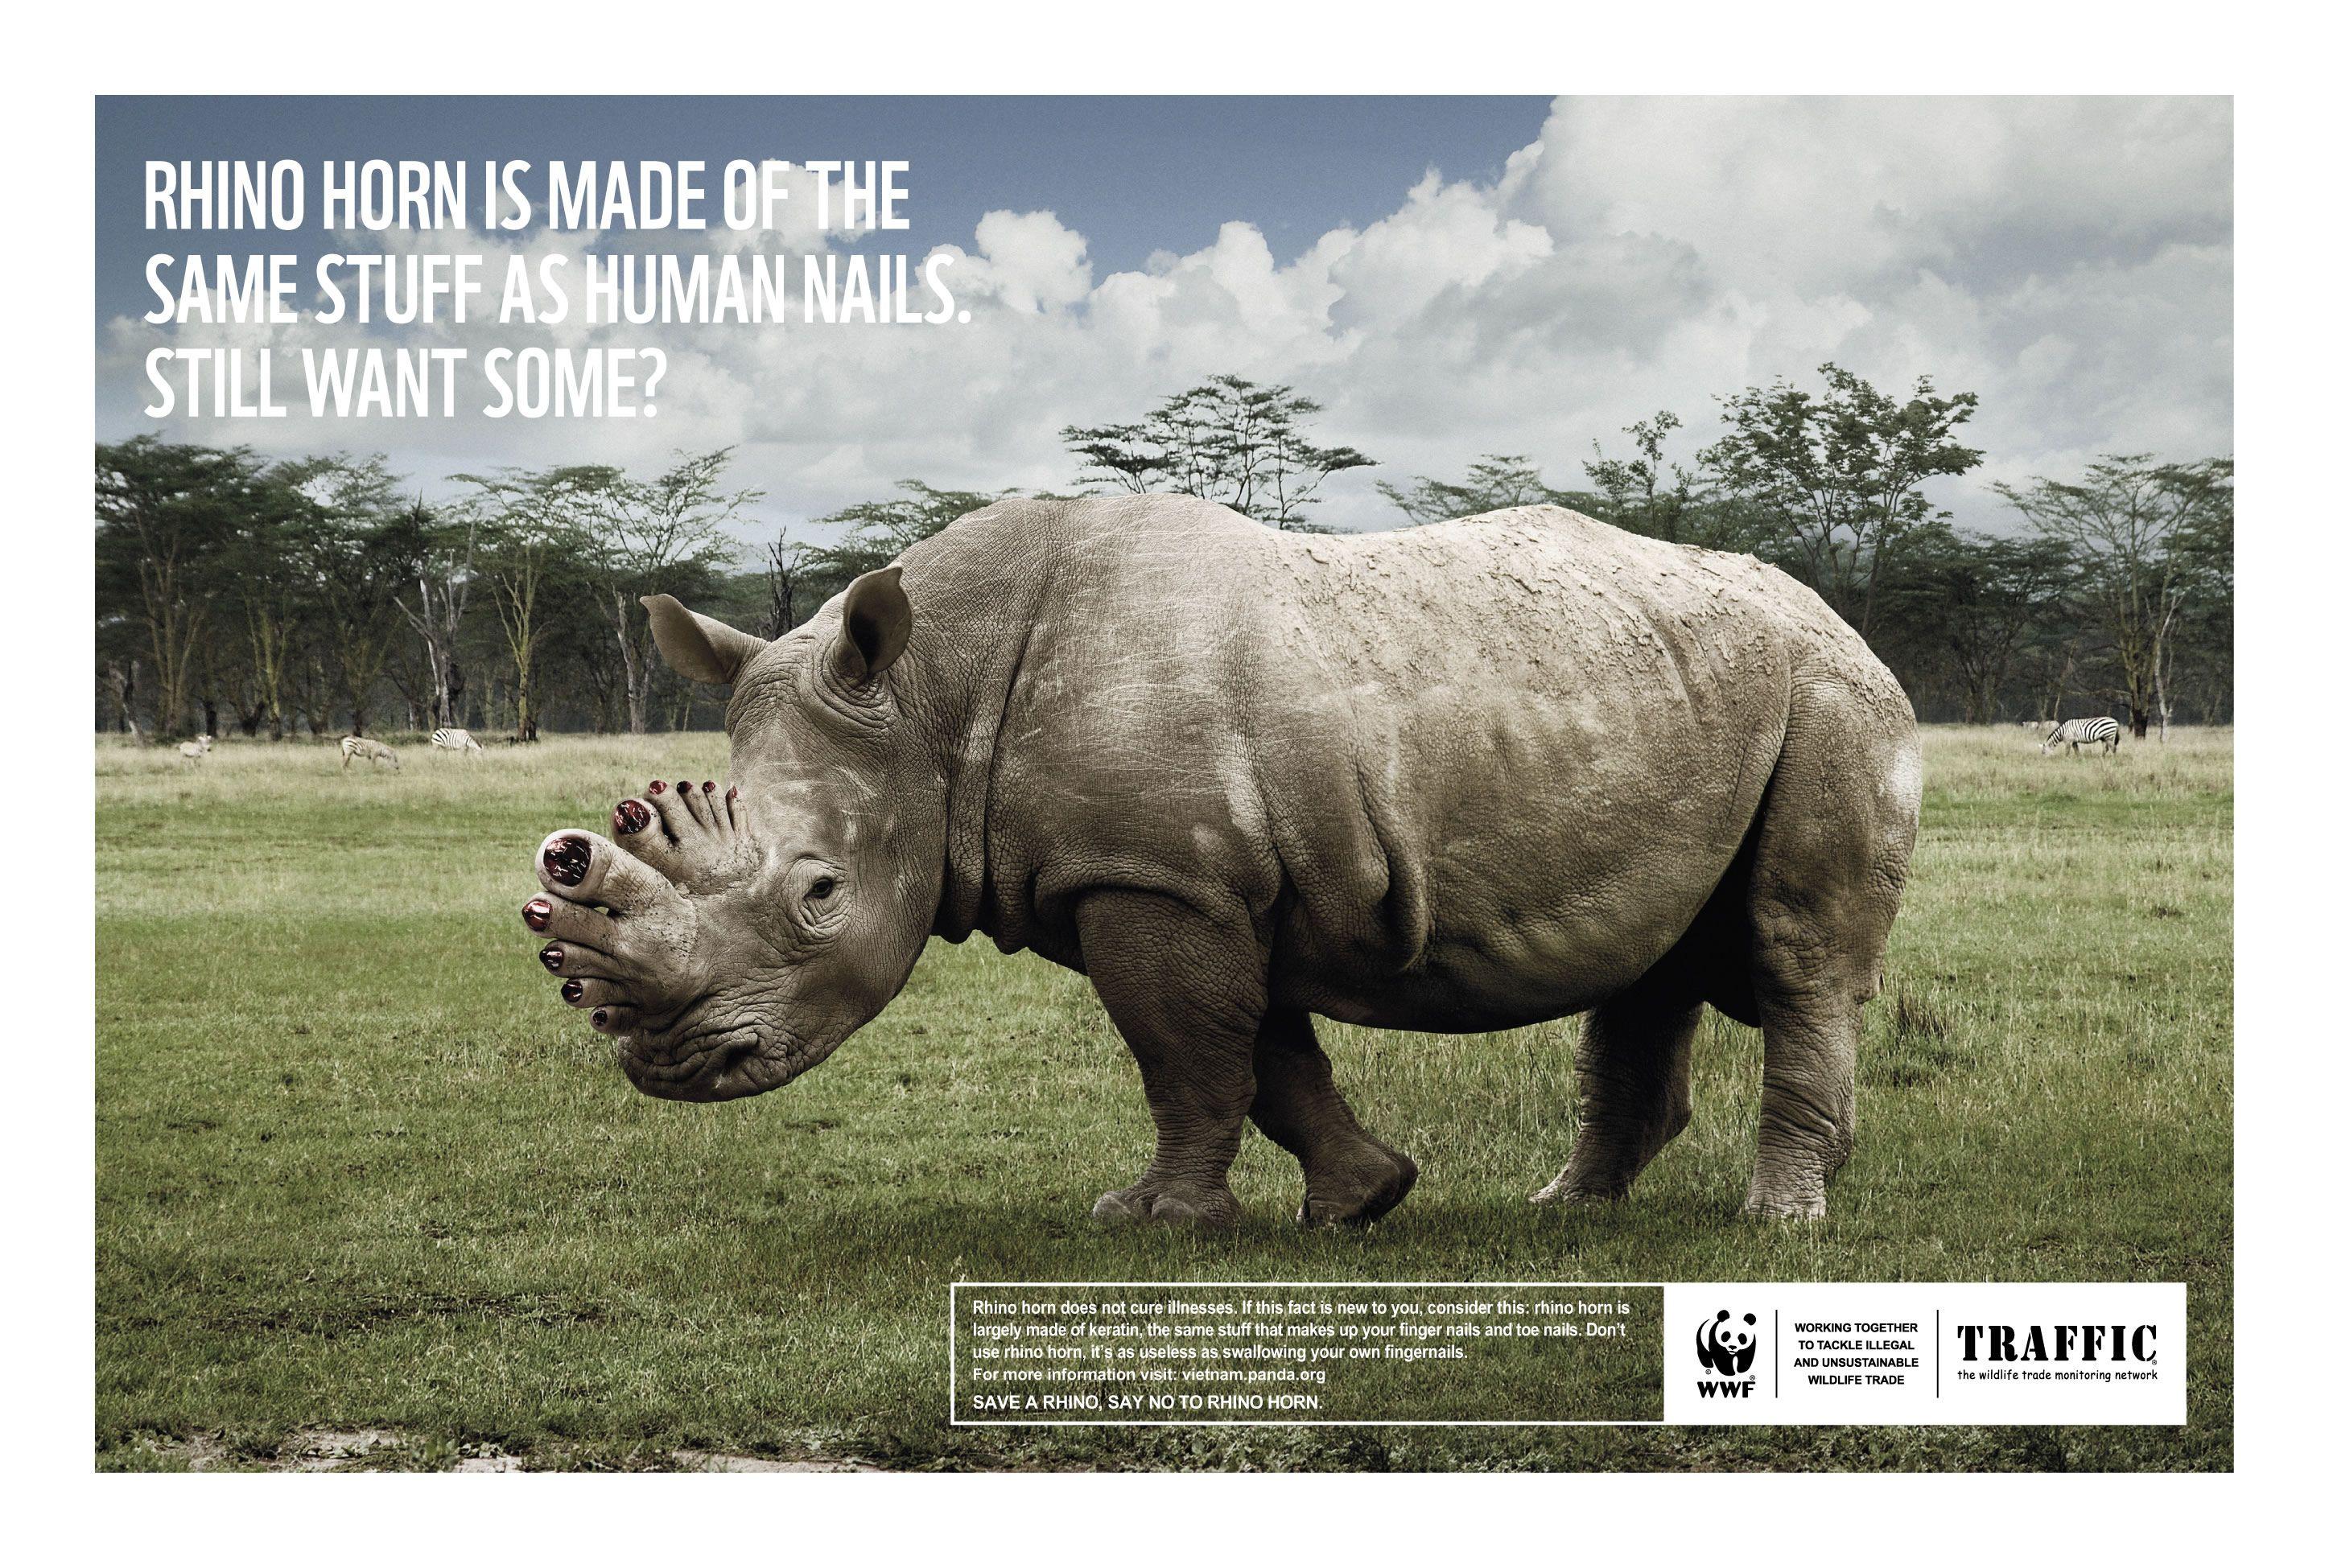 prada shoes karachi zoo rhinoceros 3d